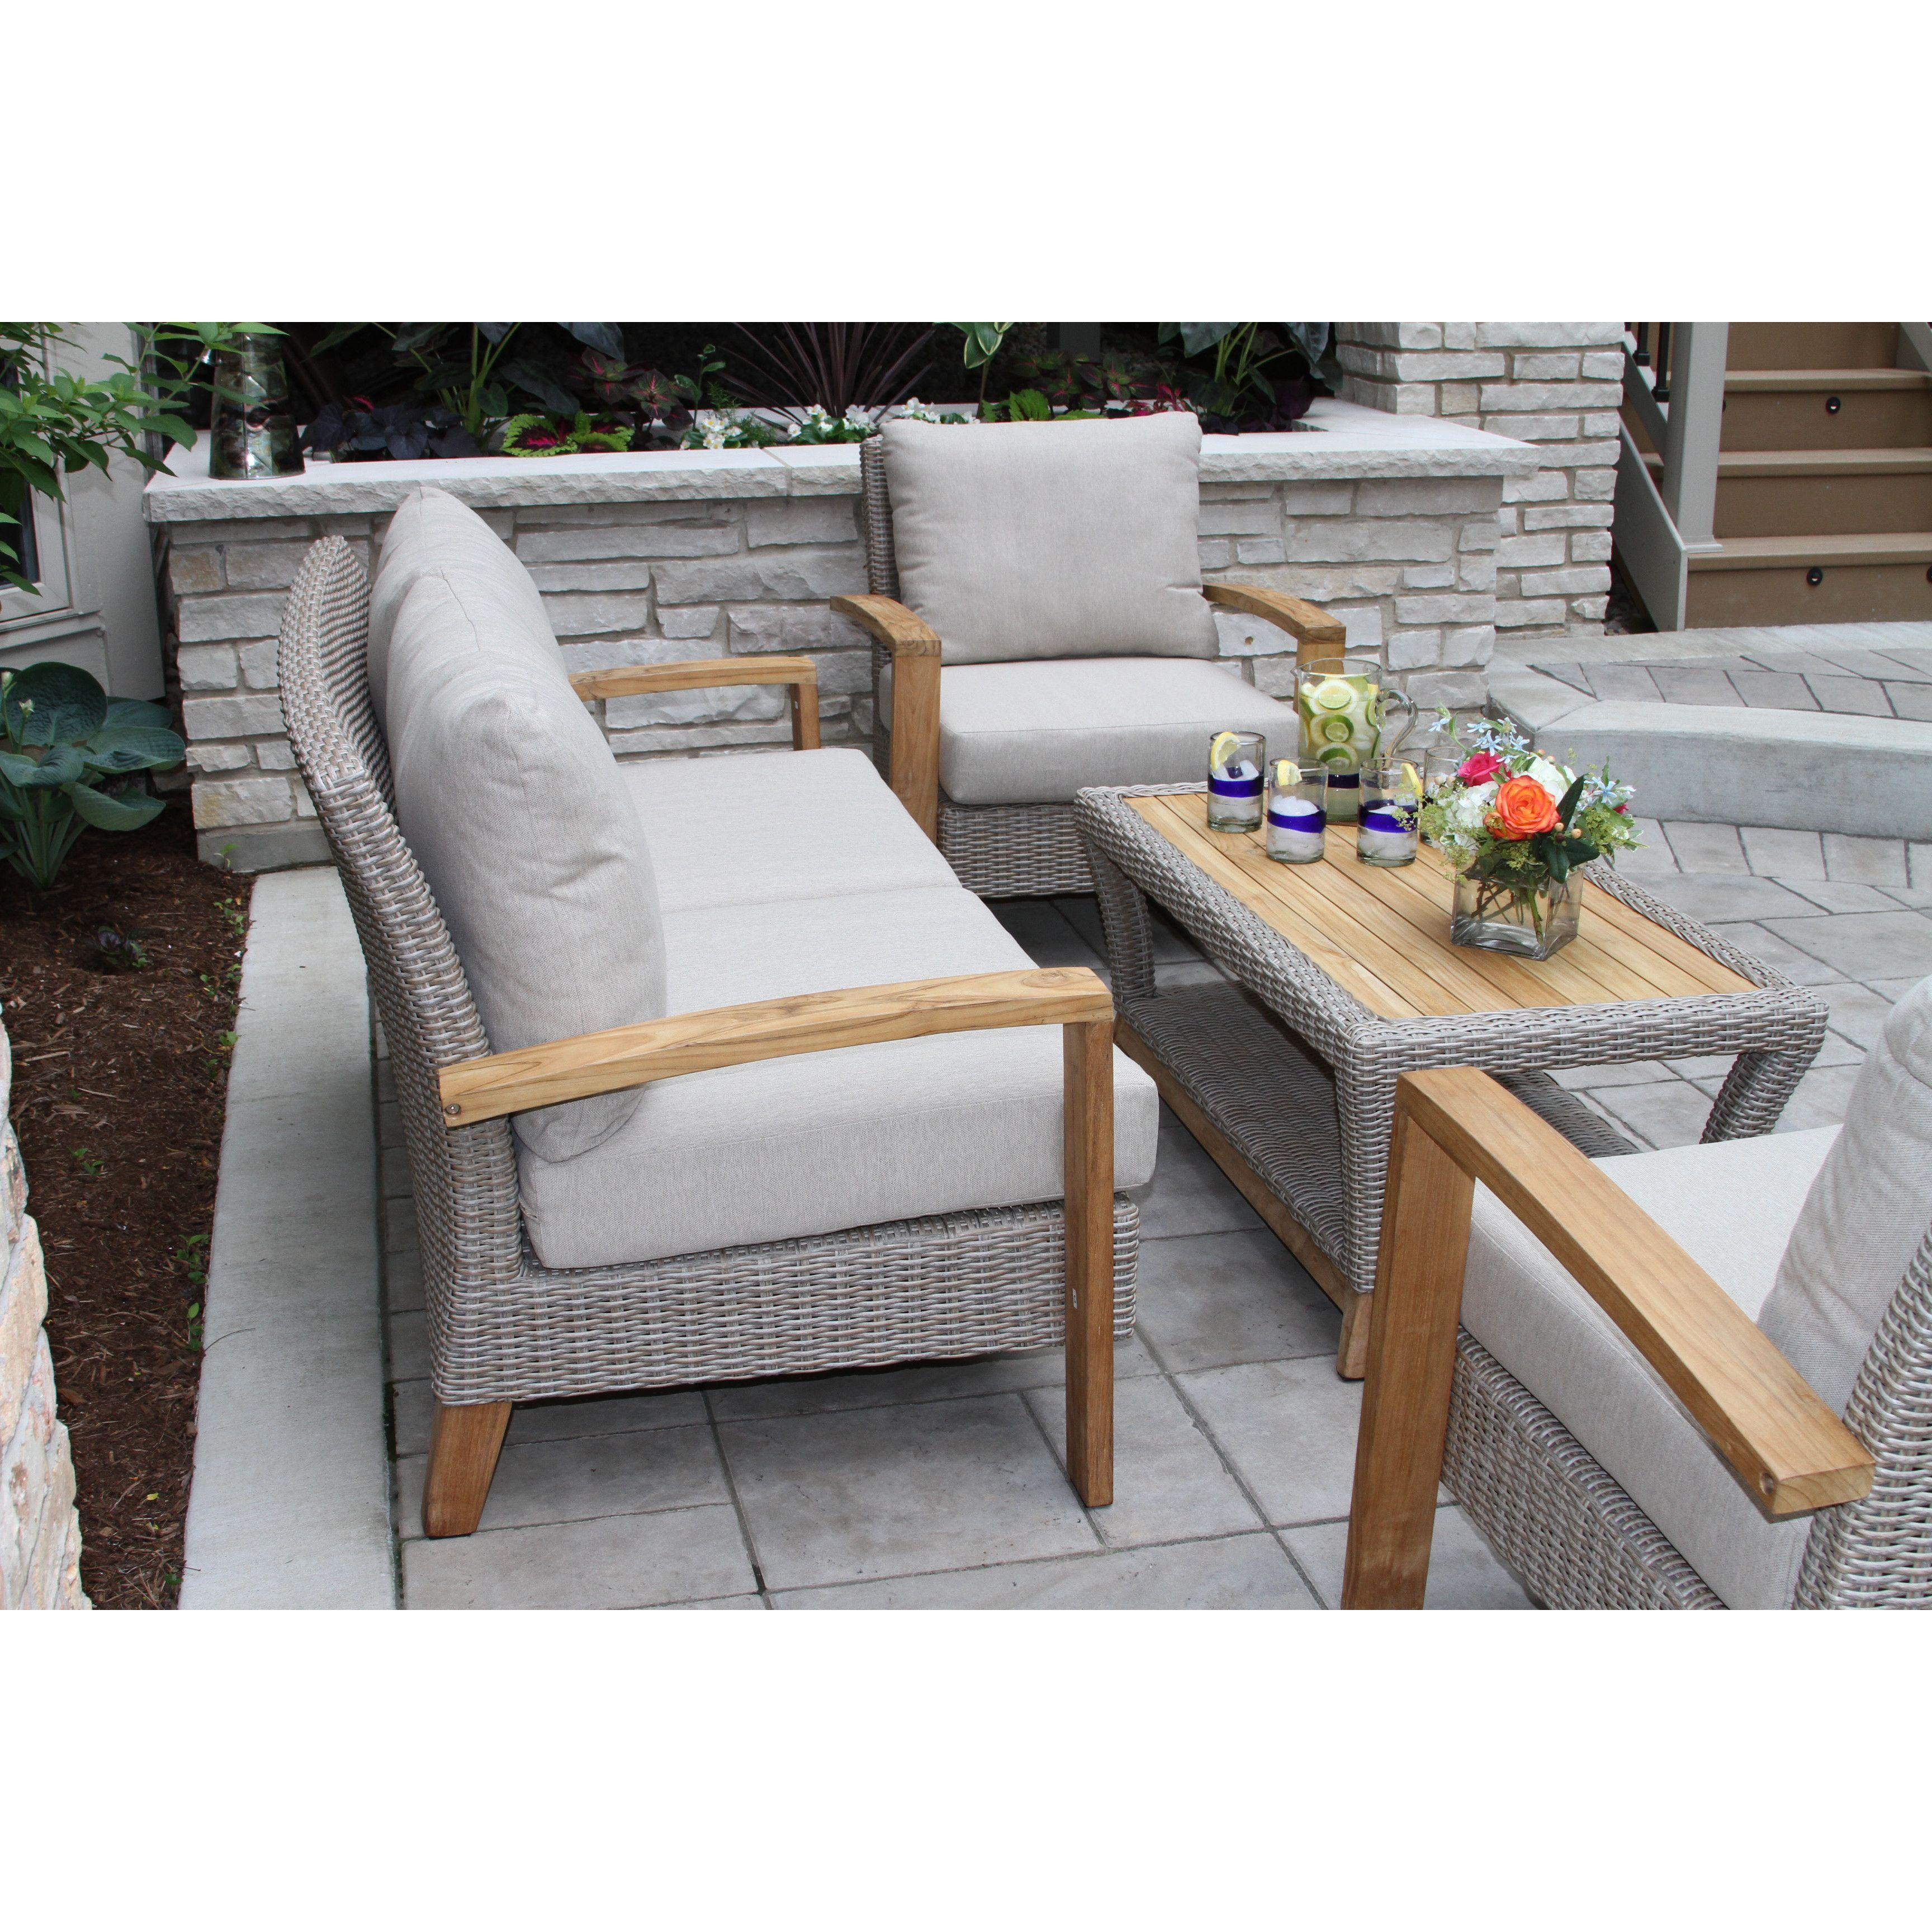 Laurel Foundry Modern Farmhouse Dillard Teak And Wicker 4 Piece Deep Seating Group With Cushion